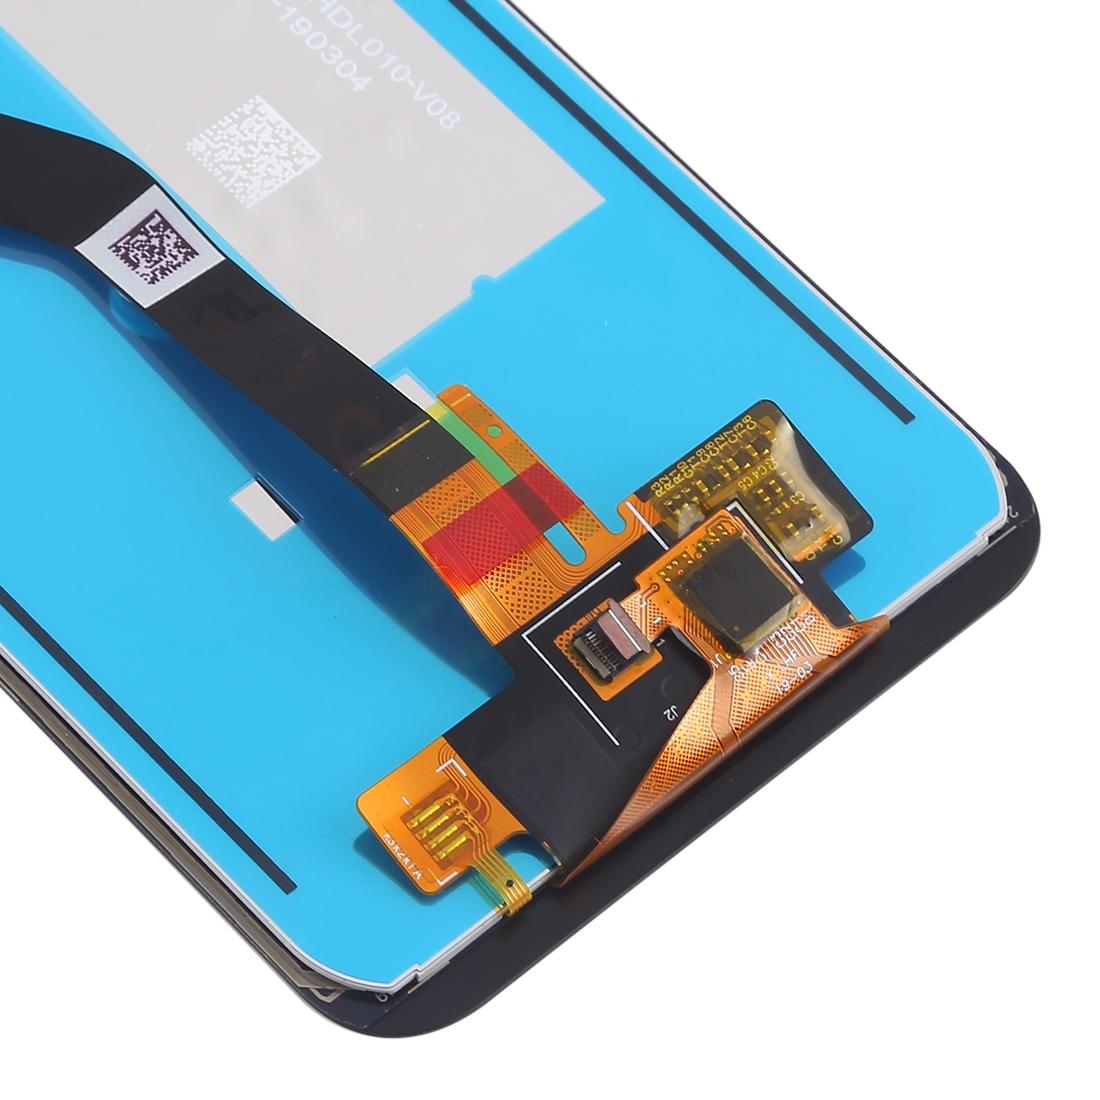 صفحه-نمایش-گوشی-موبایل-lcd-touch-screen-Honor-8A-Pro(2).jpg